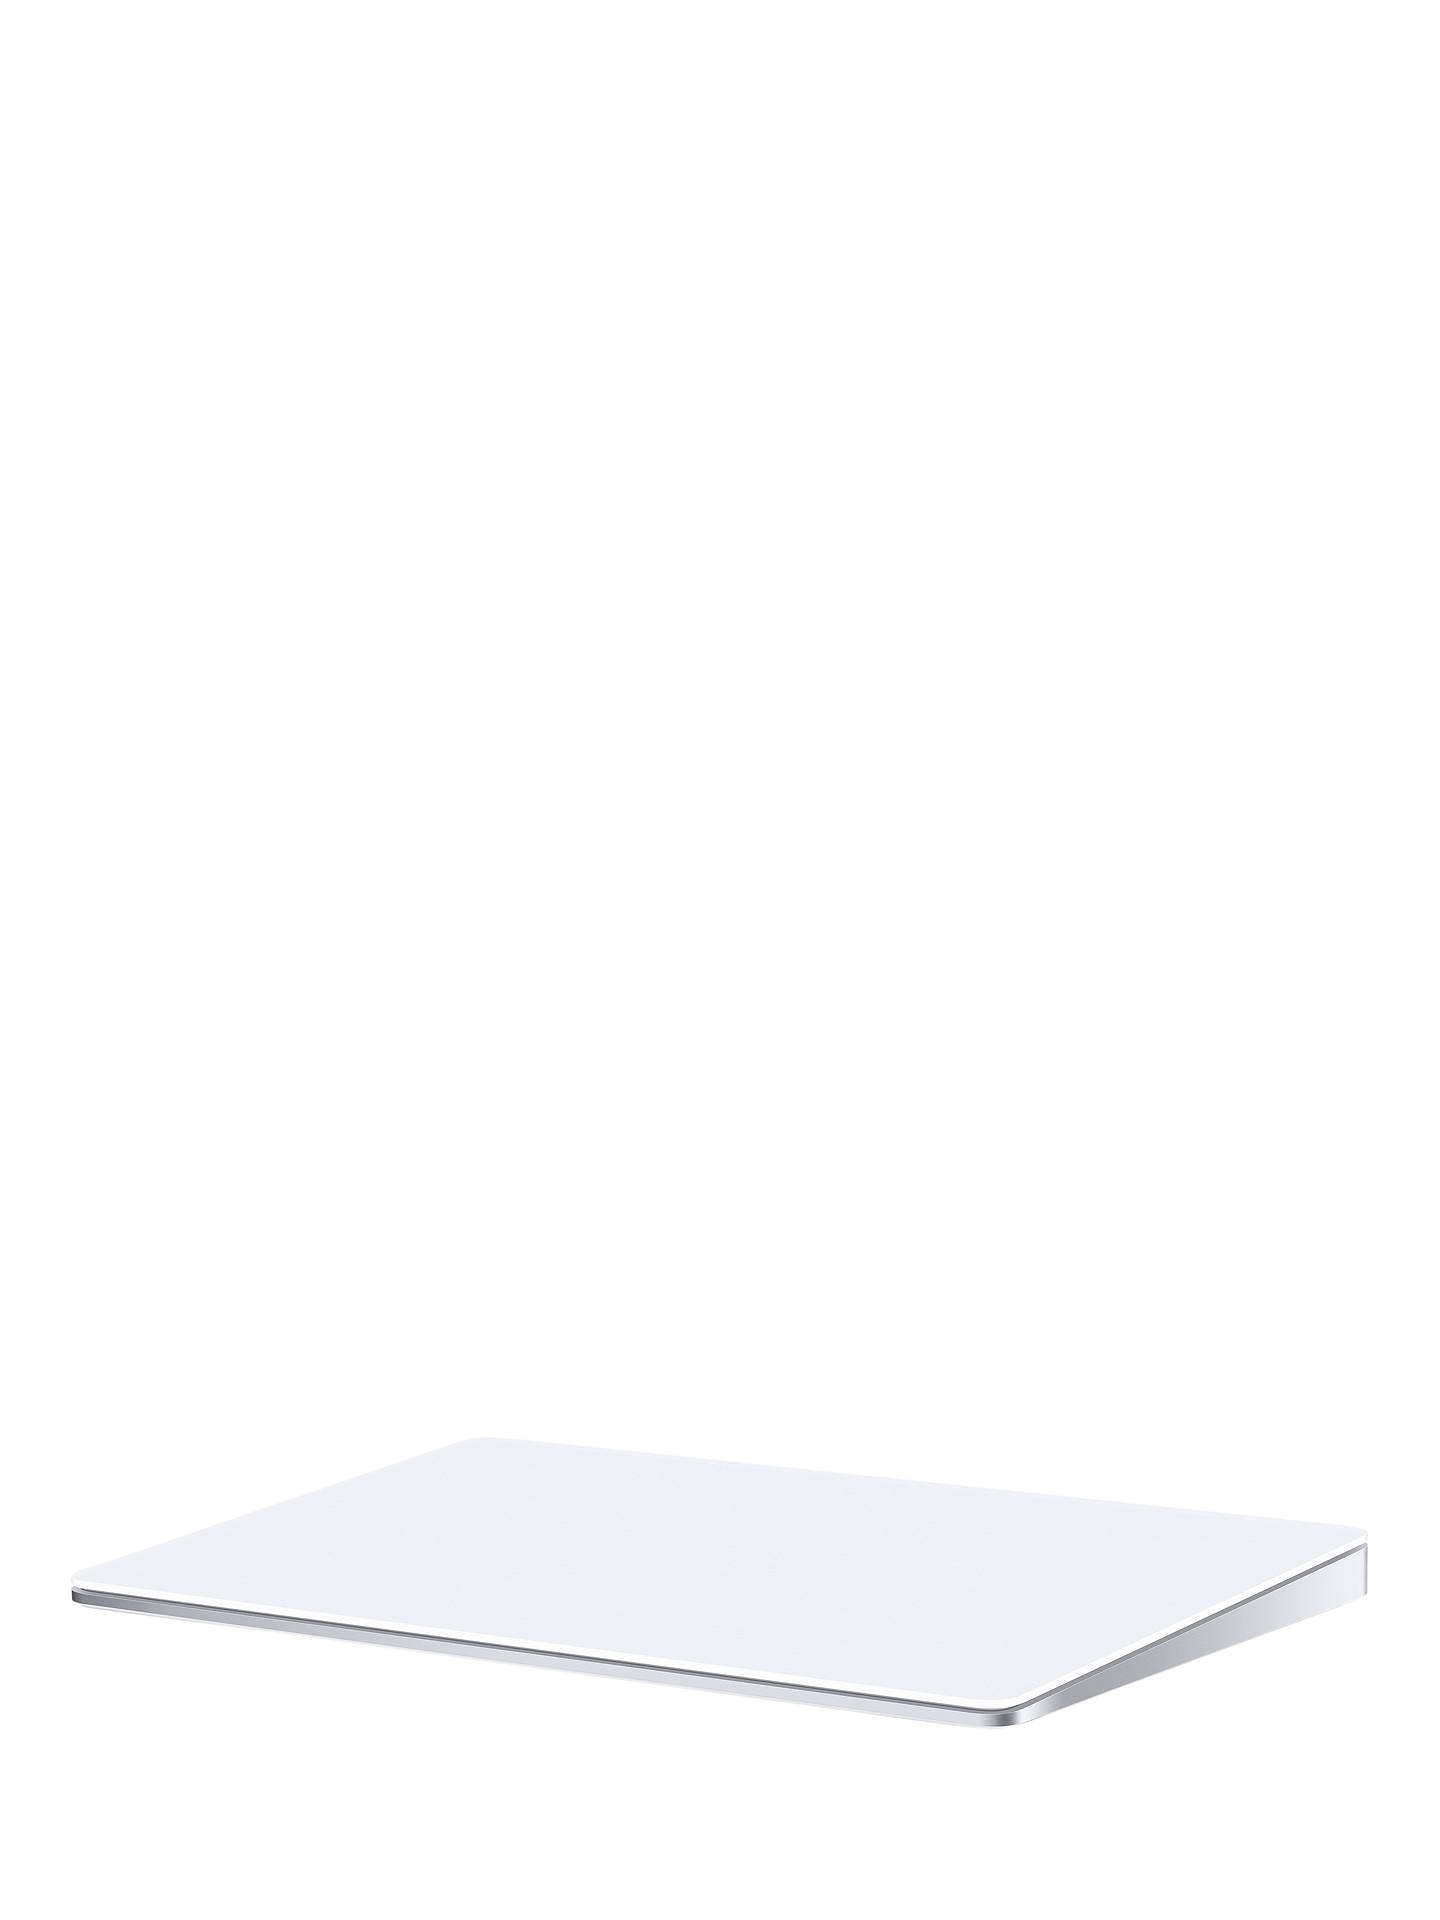 94a9fff7f71 Buy Apple MJ2R2ZM Magic Trackpad 2 Online at johnlewis.com